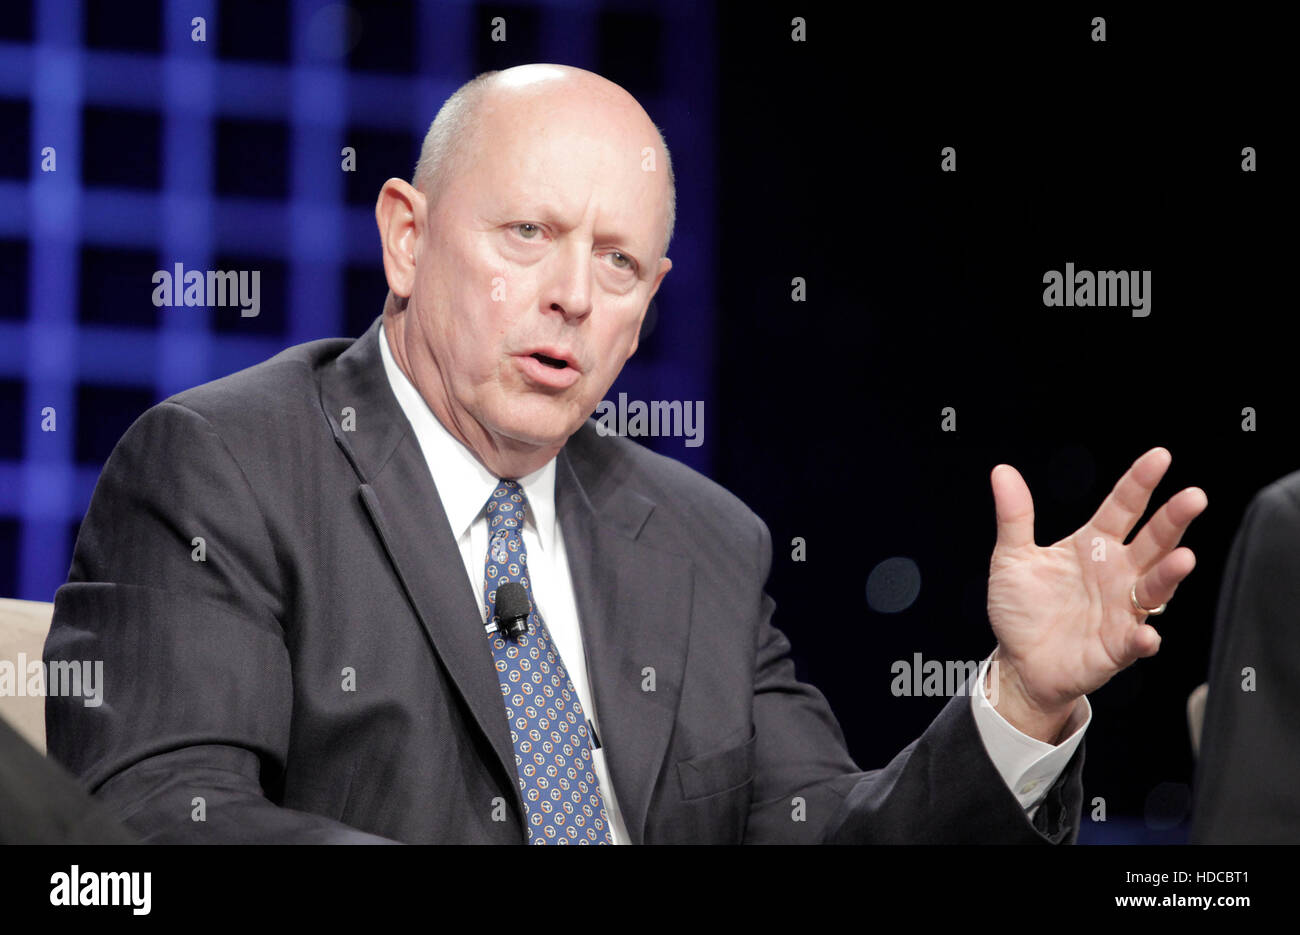 executive chairman vs ceo ergonomic stool uk michael ernst stock photos and images